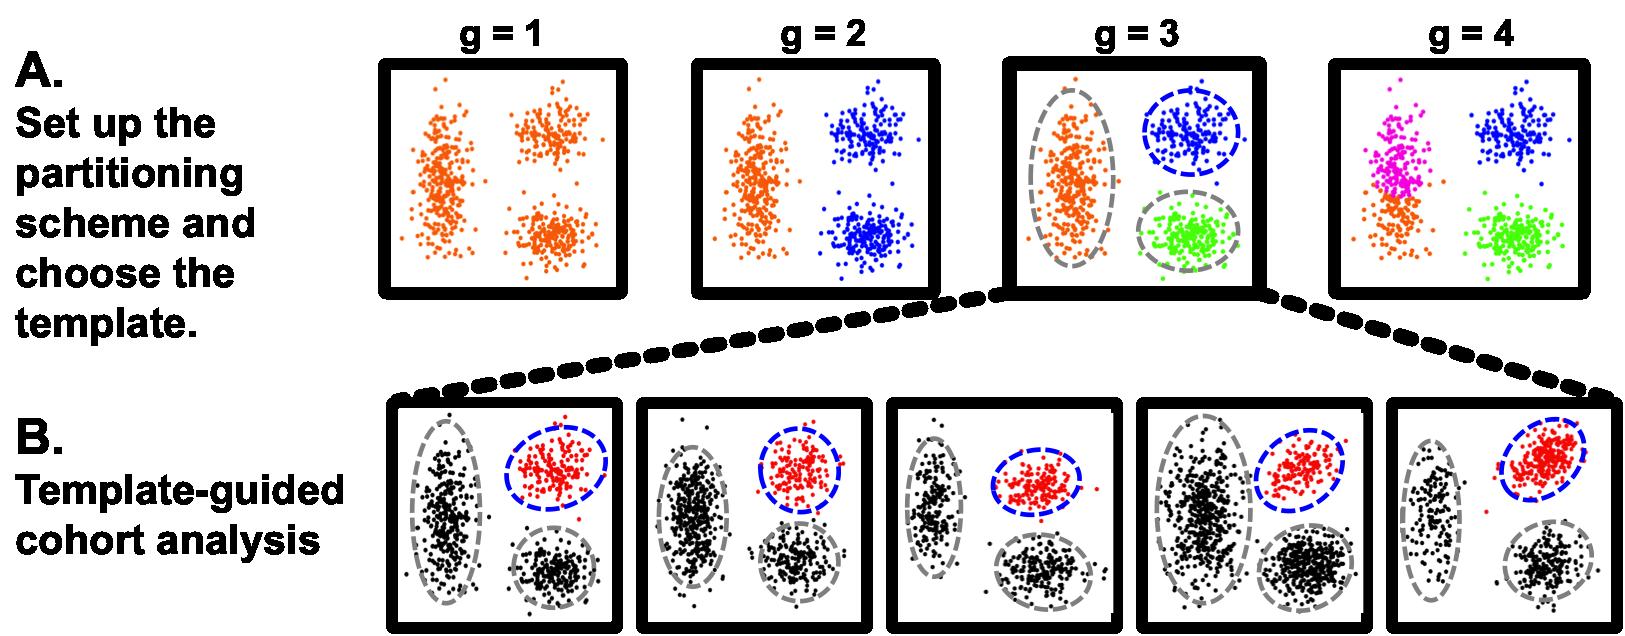 computational text analysis raychaudhuri soumya